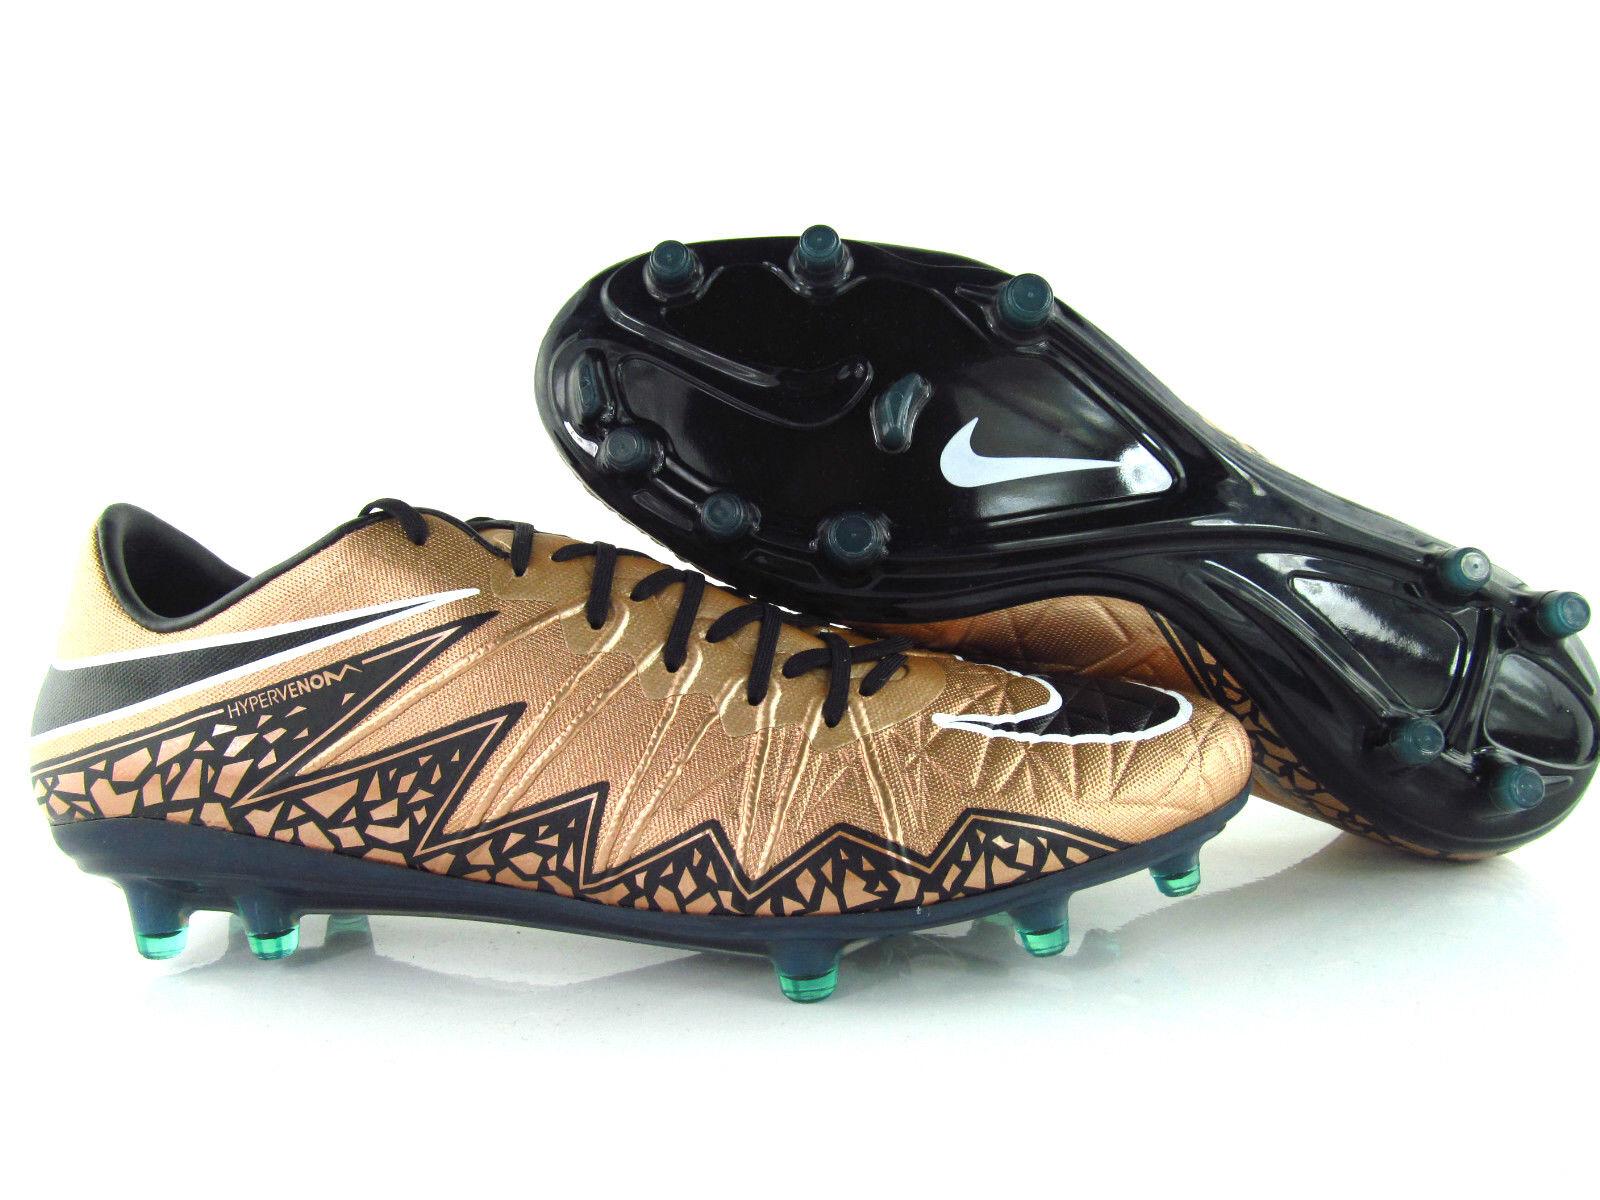 Nike hypervenom phinish FG acc 749901 903 us_8-9-9.5-13 eur_41-42.5-43-44-47.5